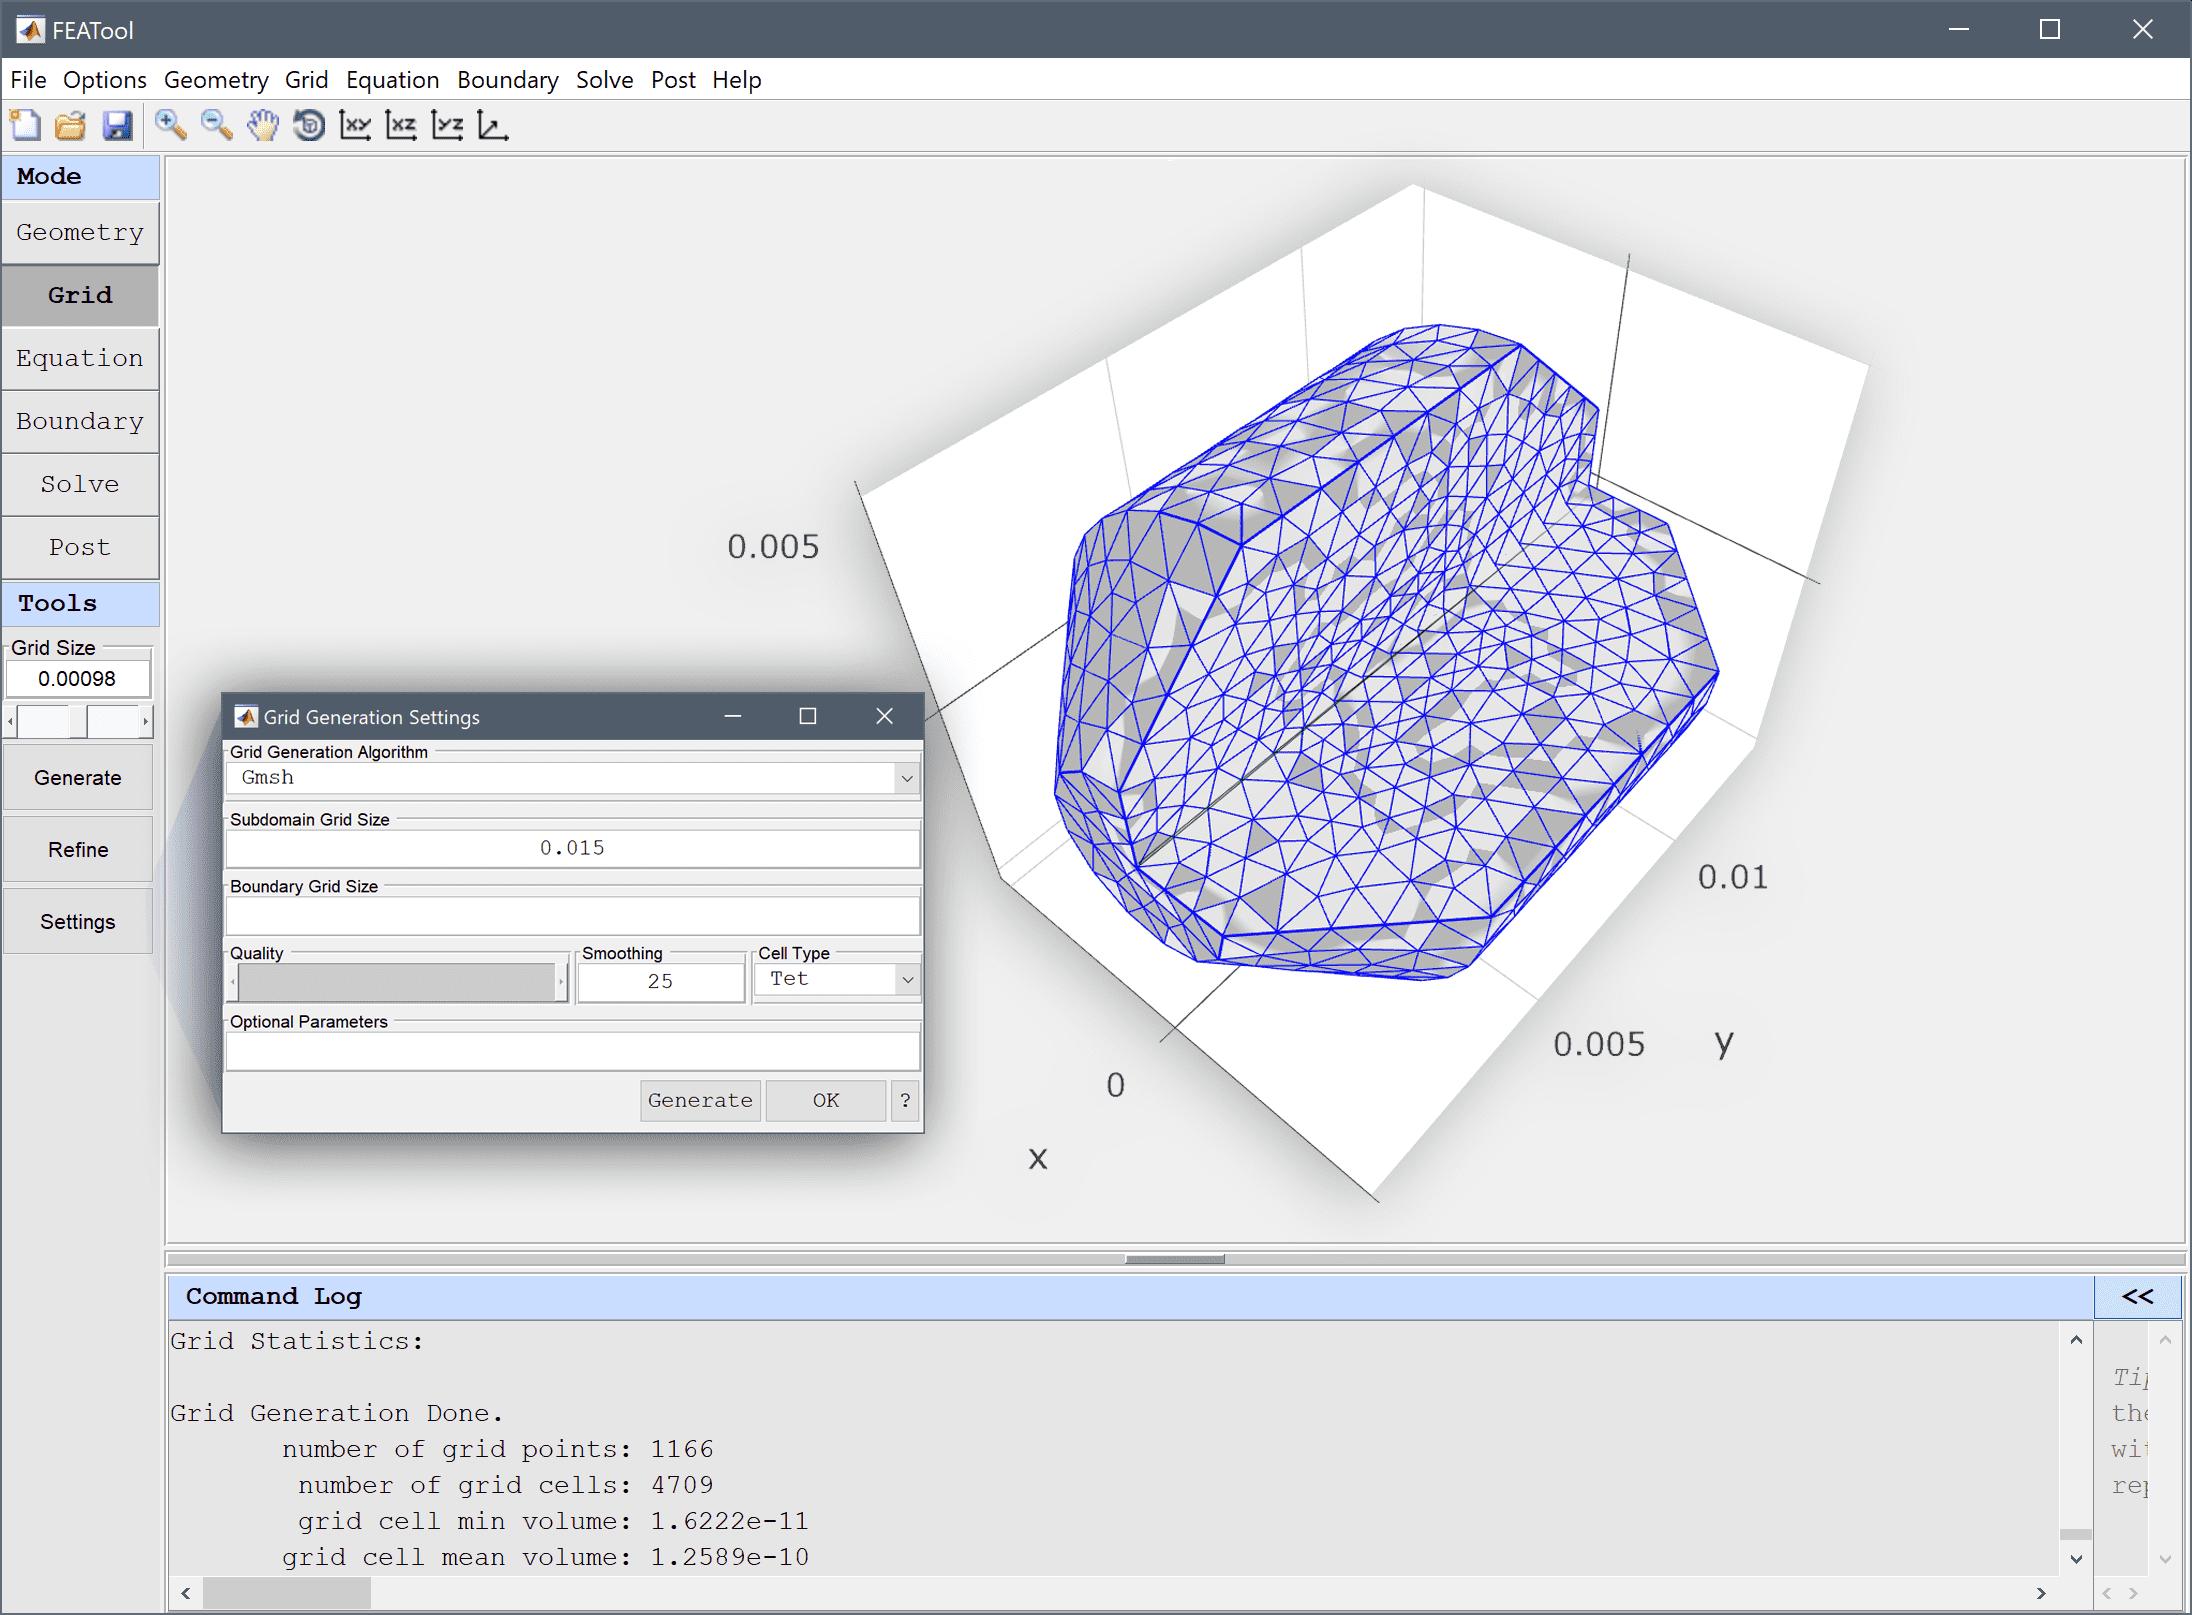 File:02-grid-mesh-generation-mode-featool-multiphysics-matlab-gui